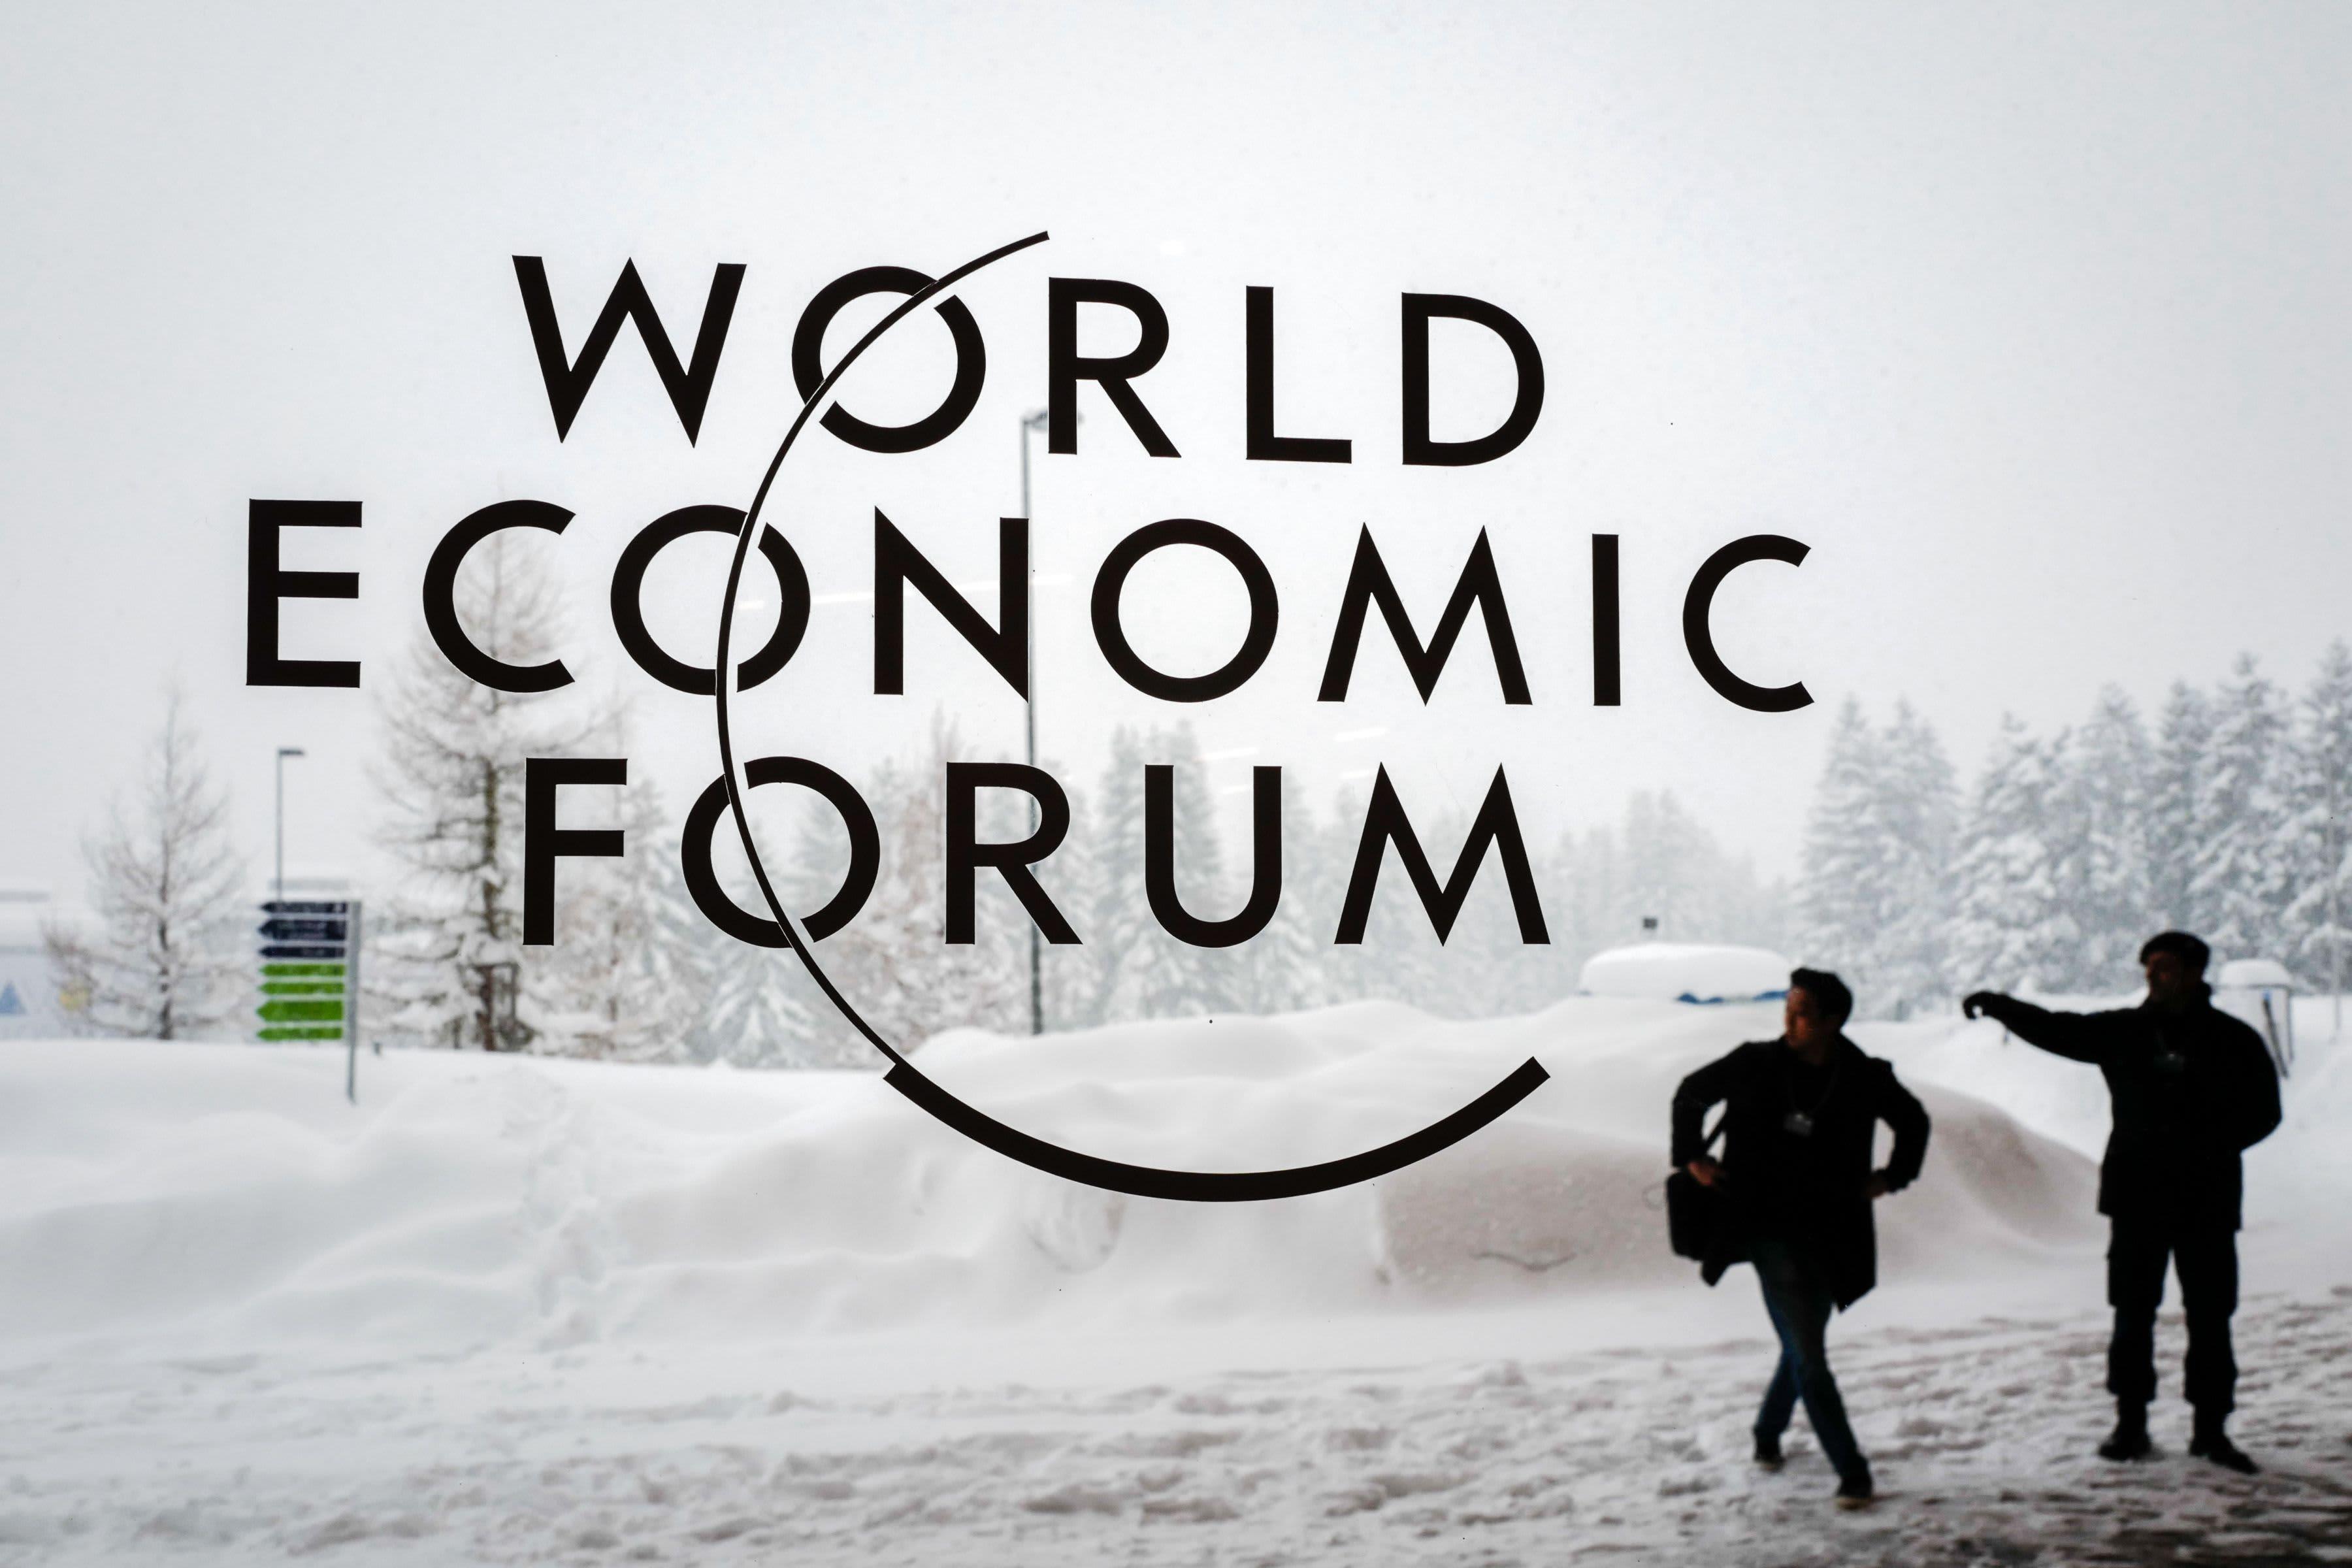 Has 'Davos Man' now morphed into 'Davos Everyone'?